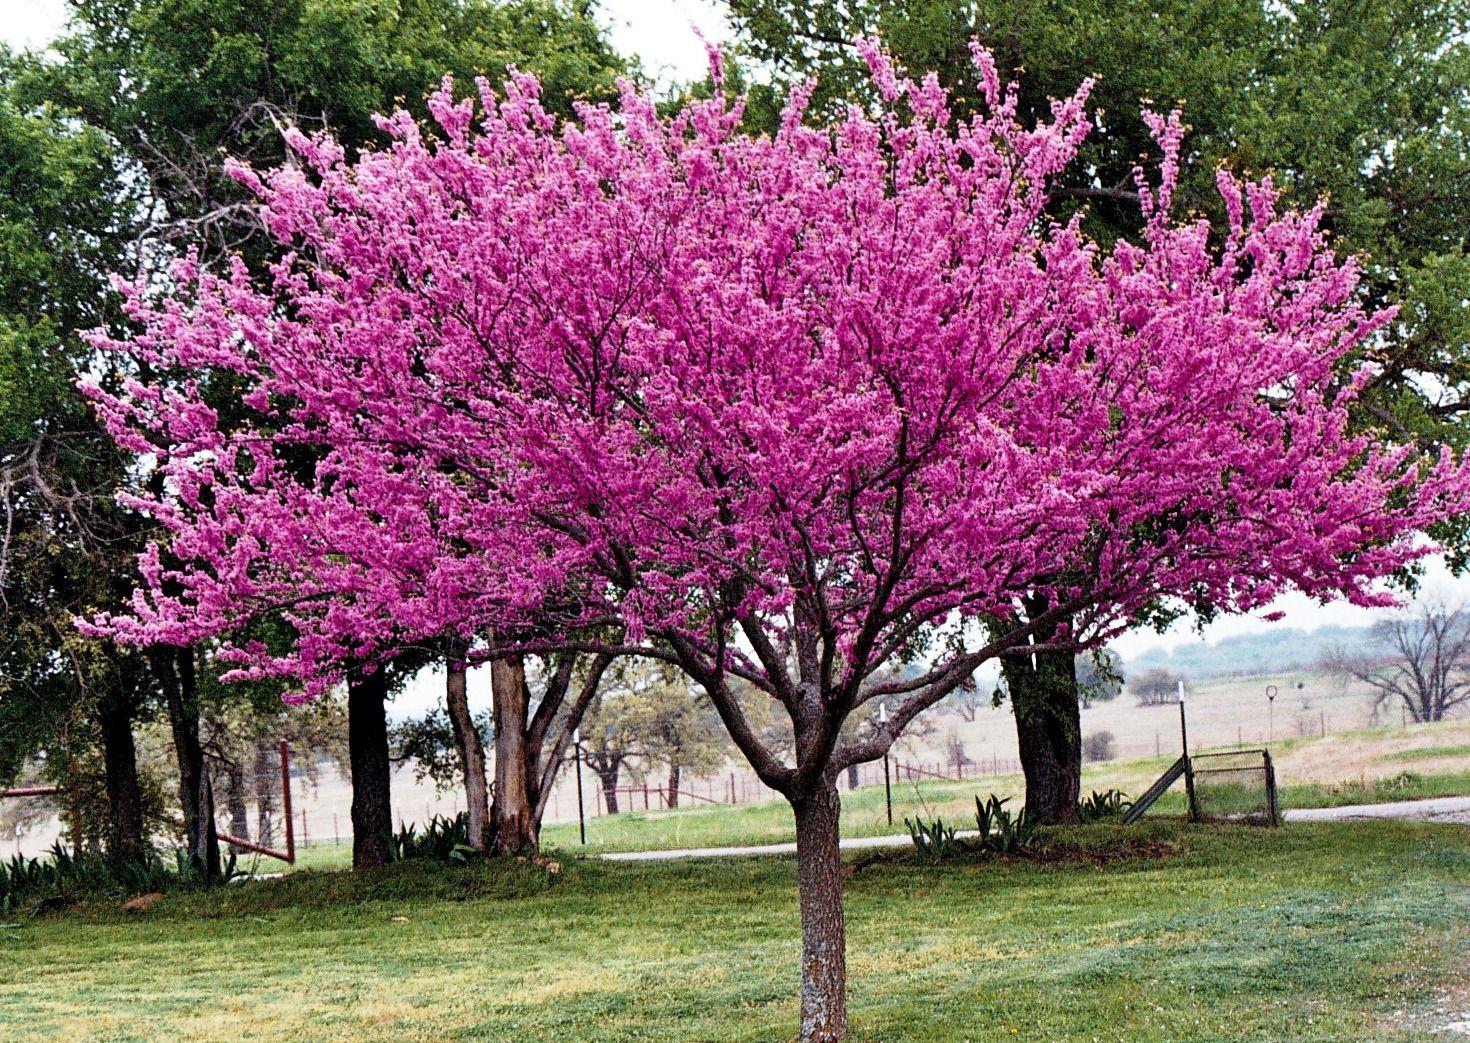 My Talented Friend Caroline Clemmons Is My Guest Eastern Redbud Tree Redbud Tree Eastern Redbud